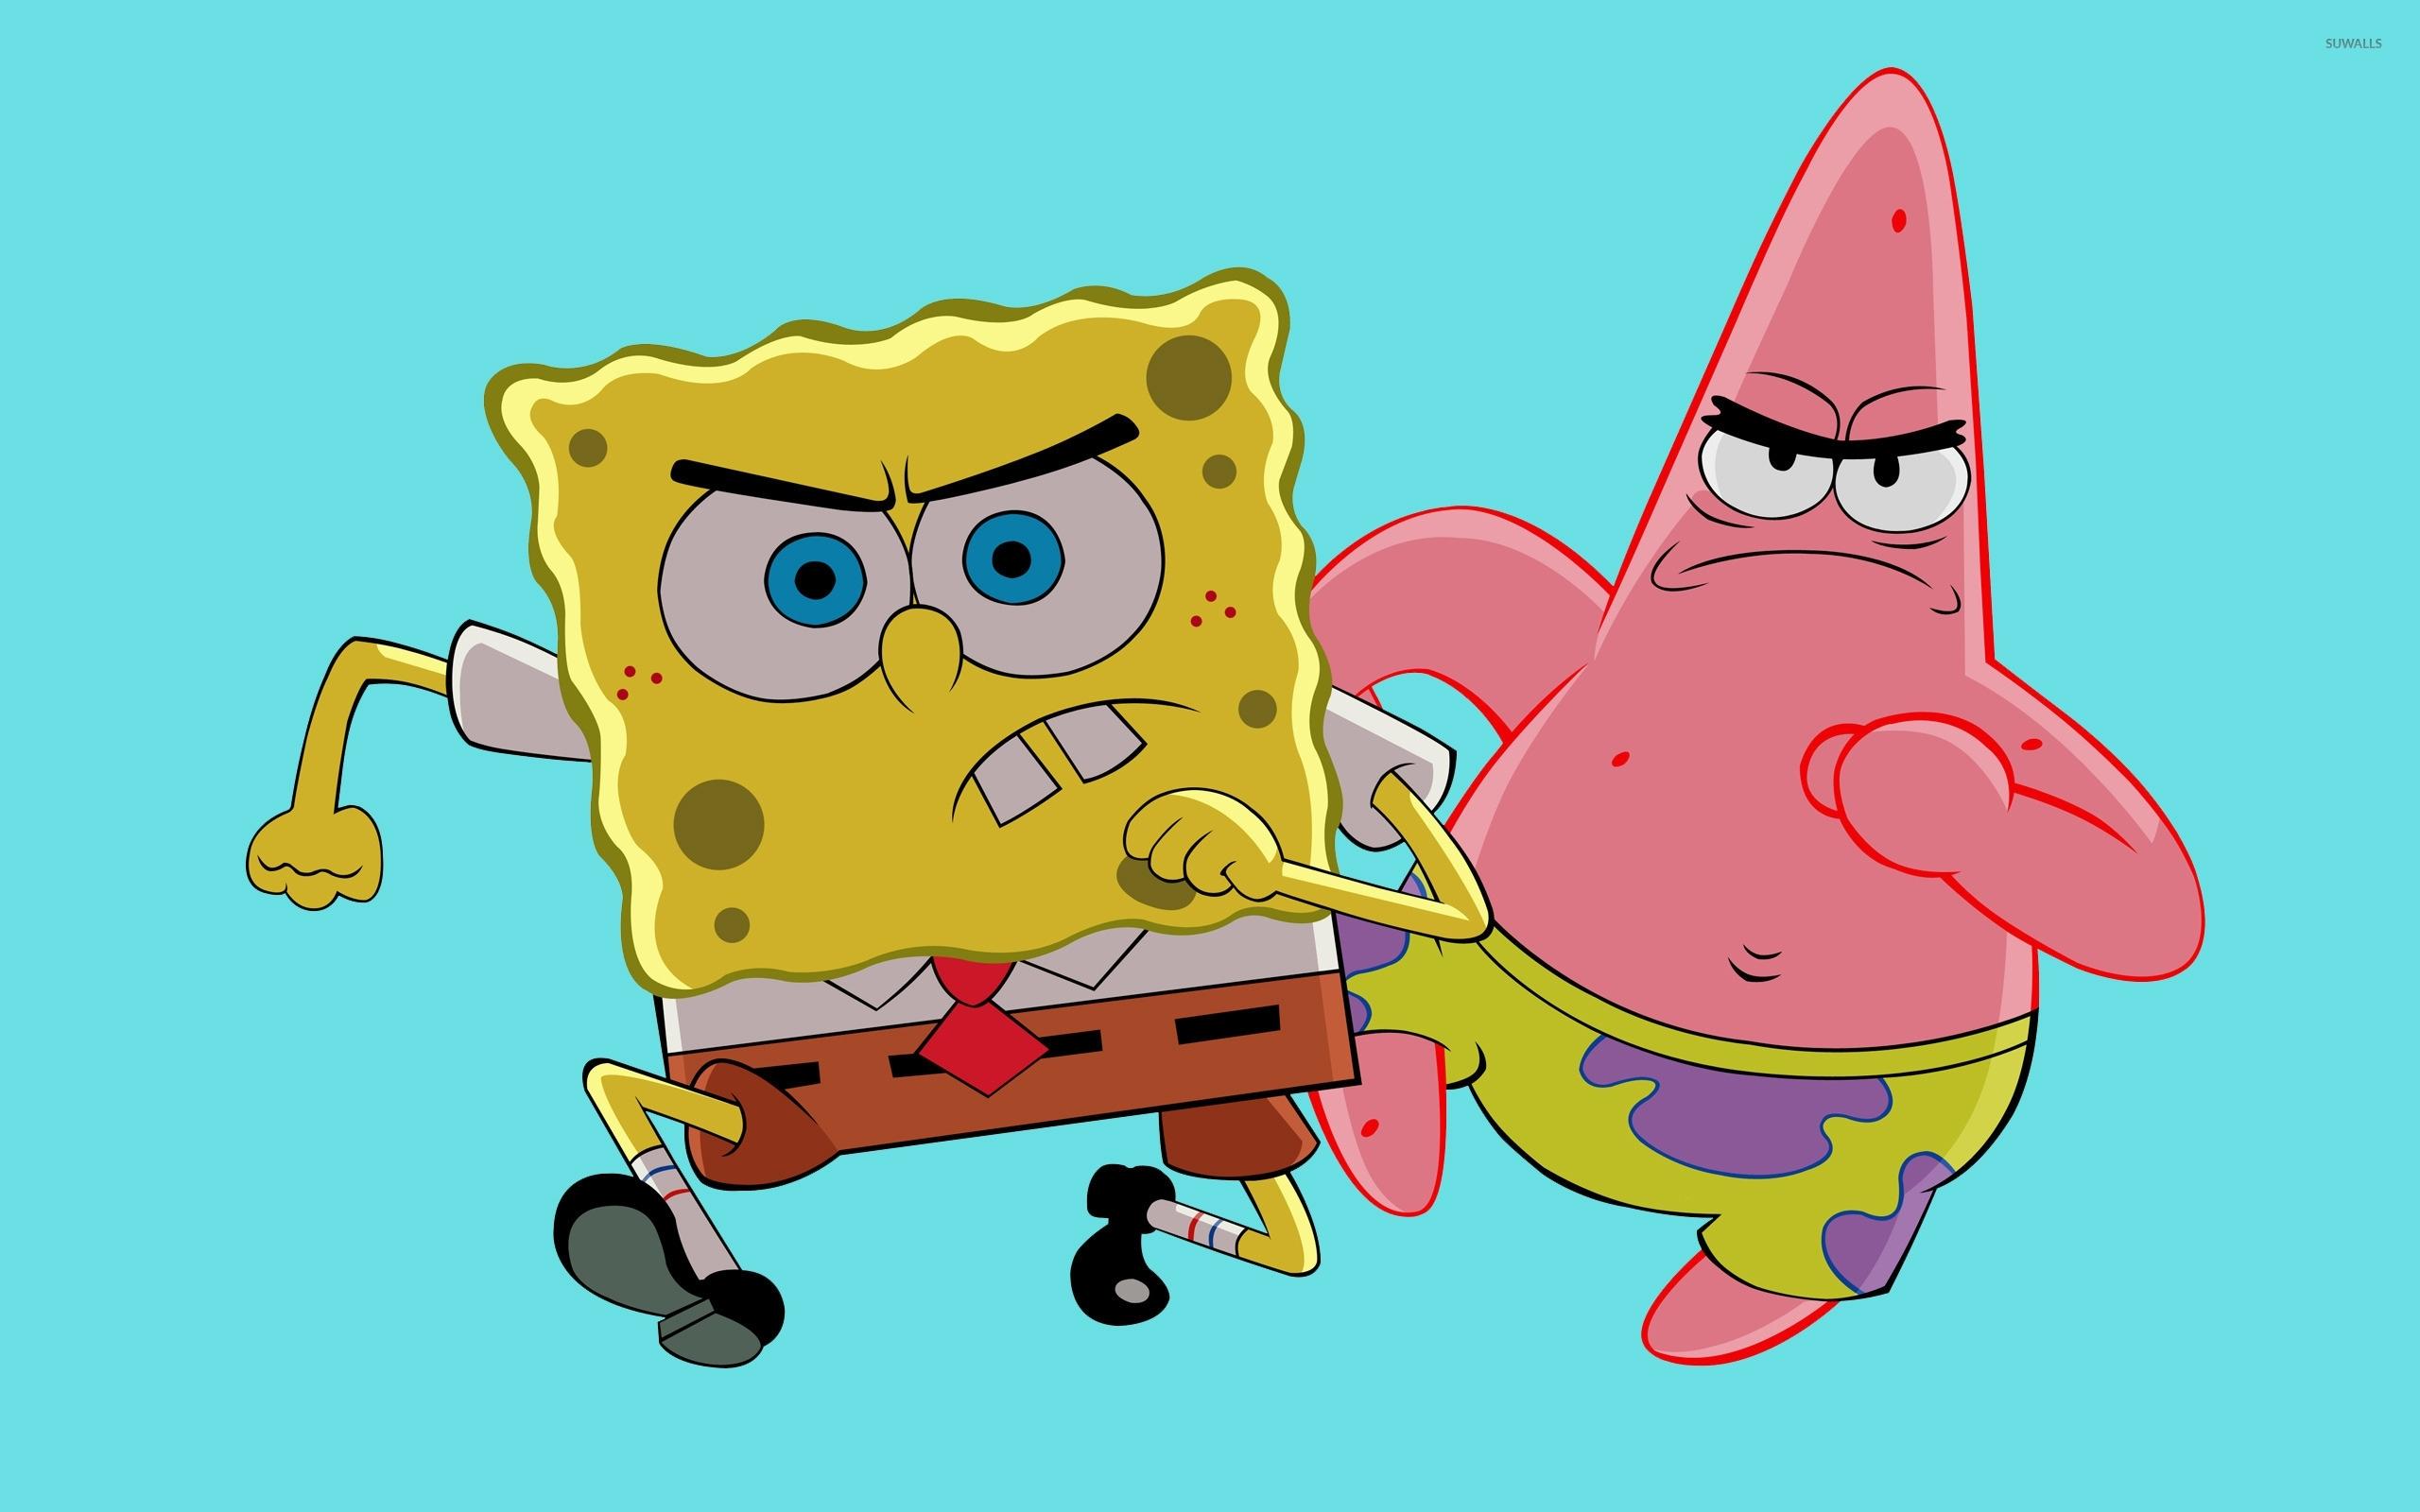 spongebob and patrick wallpaper - cartoon wallpapers - #11497